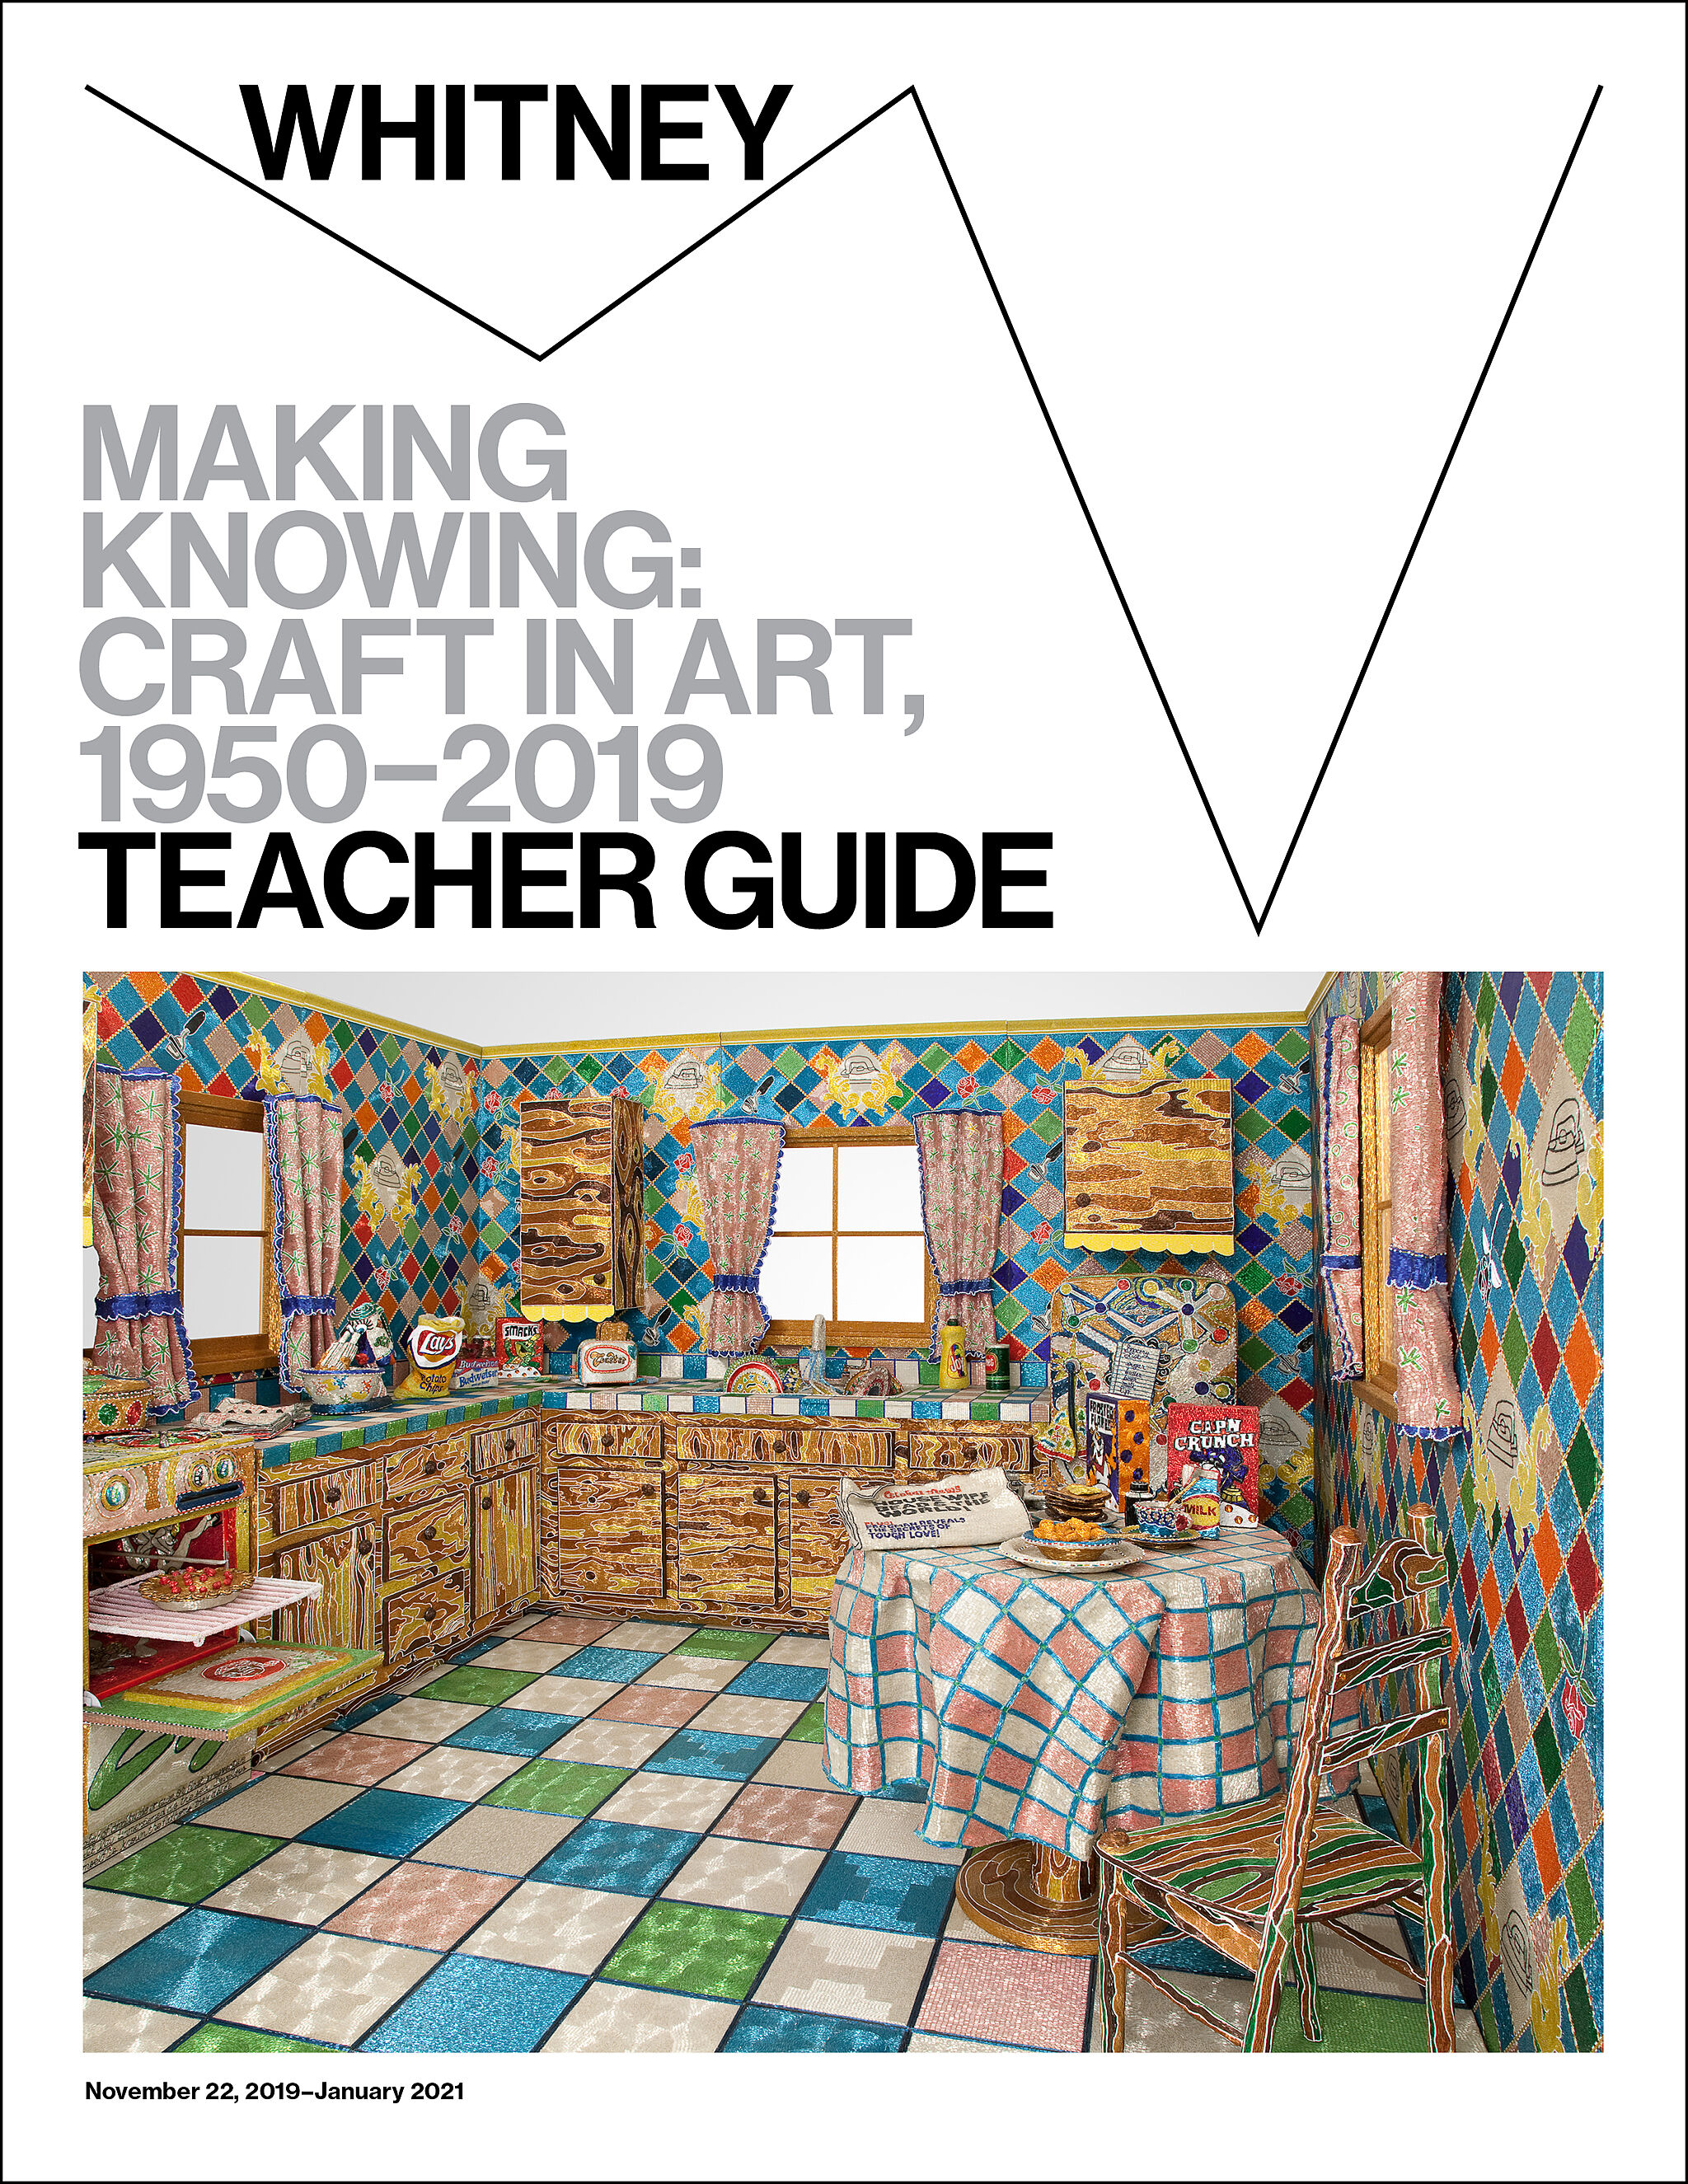 A teacher guide cover design featuring an artwork by Liza Lou.